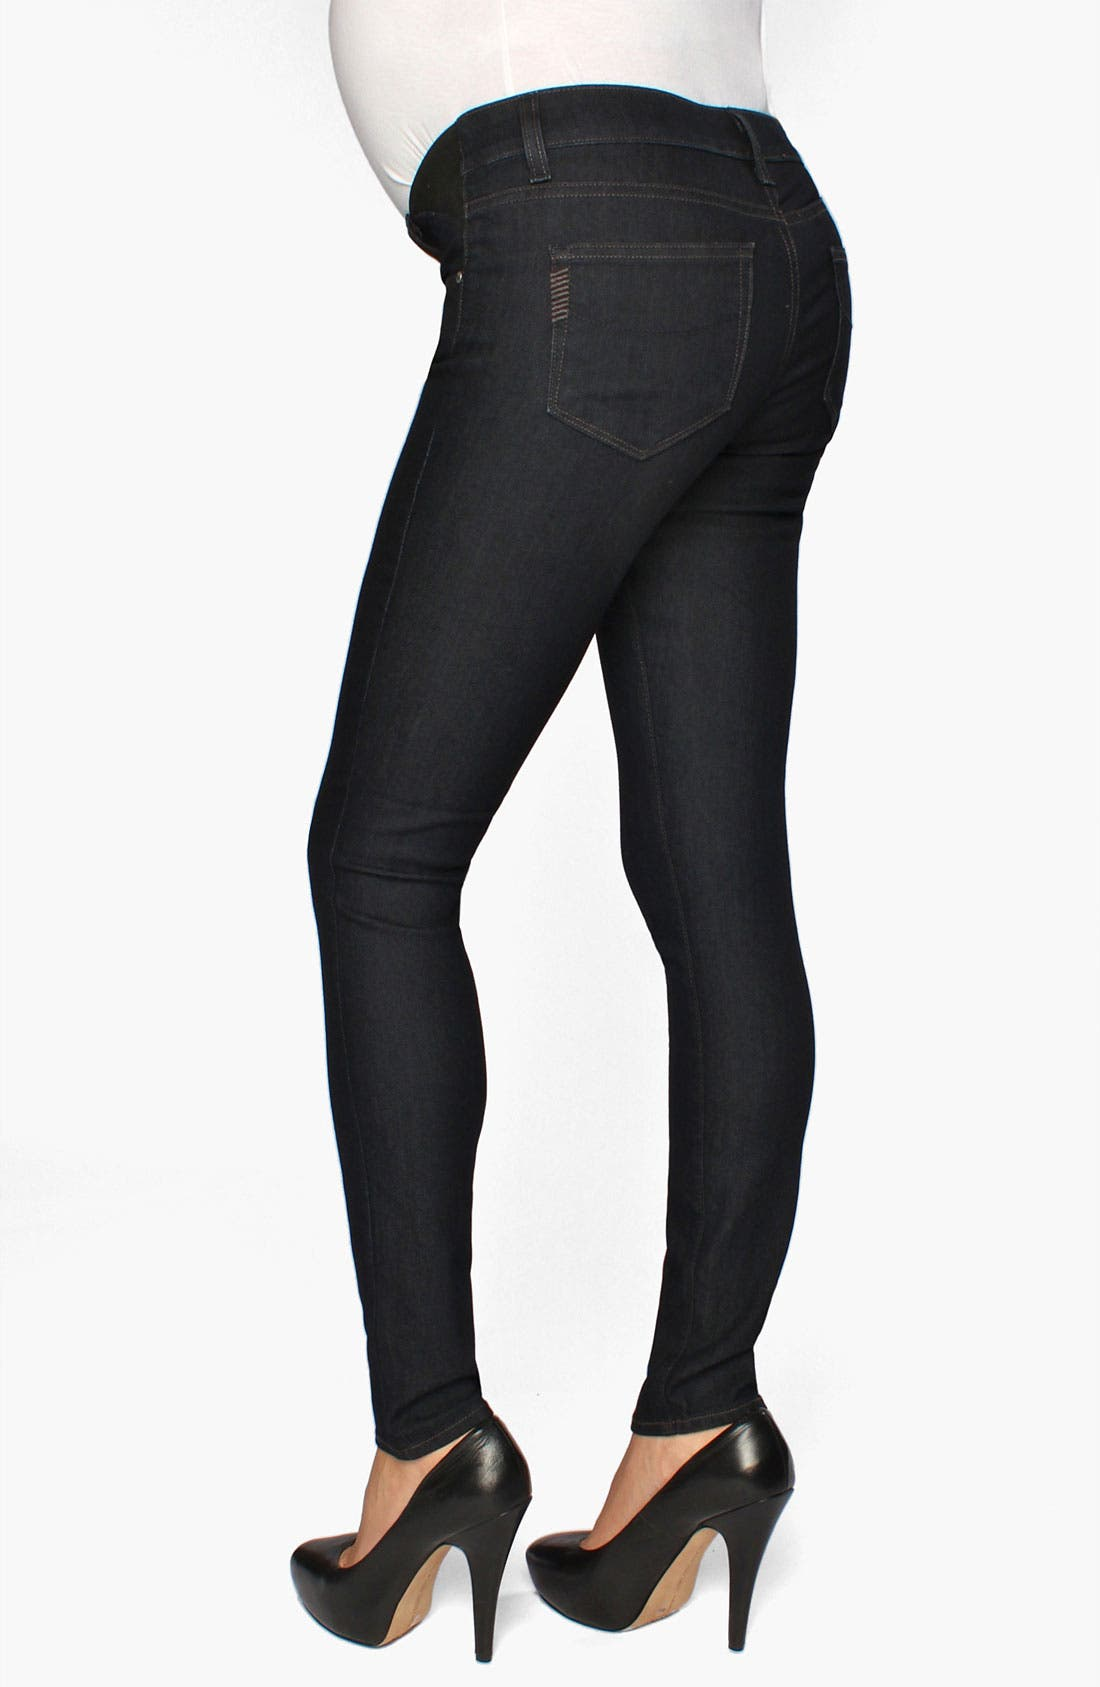 Main Image - Paige Denim 'Verdugo' Maternity Ultra Skinny Jeans (Twilight)